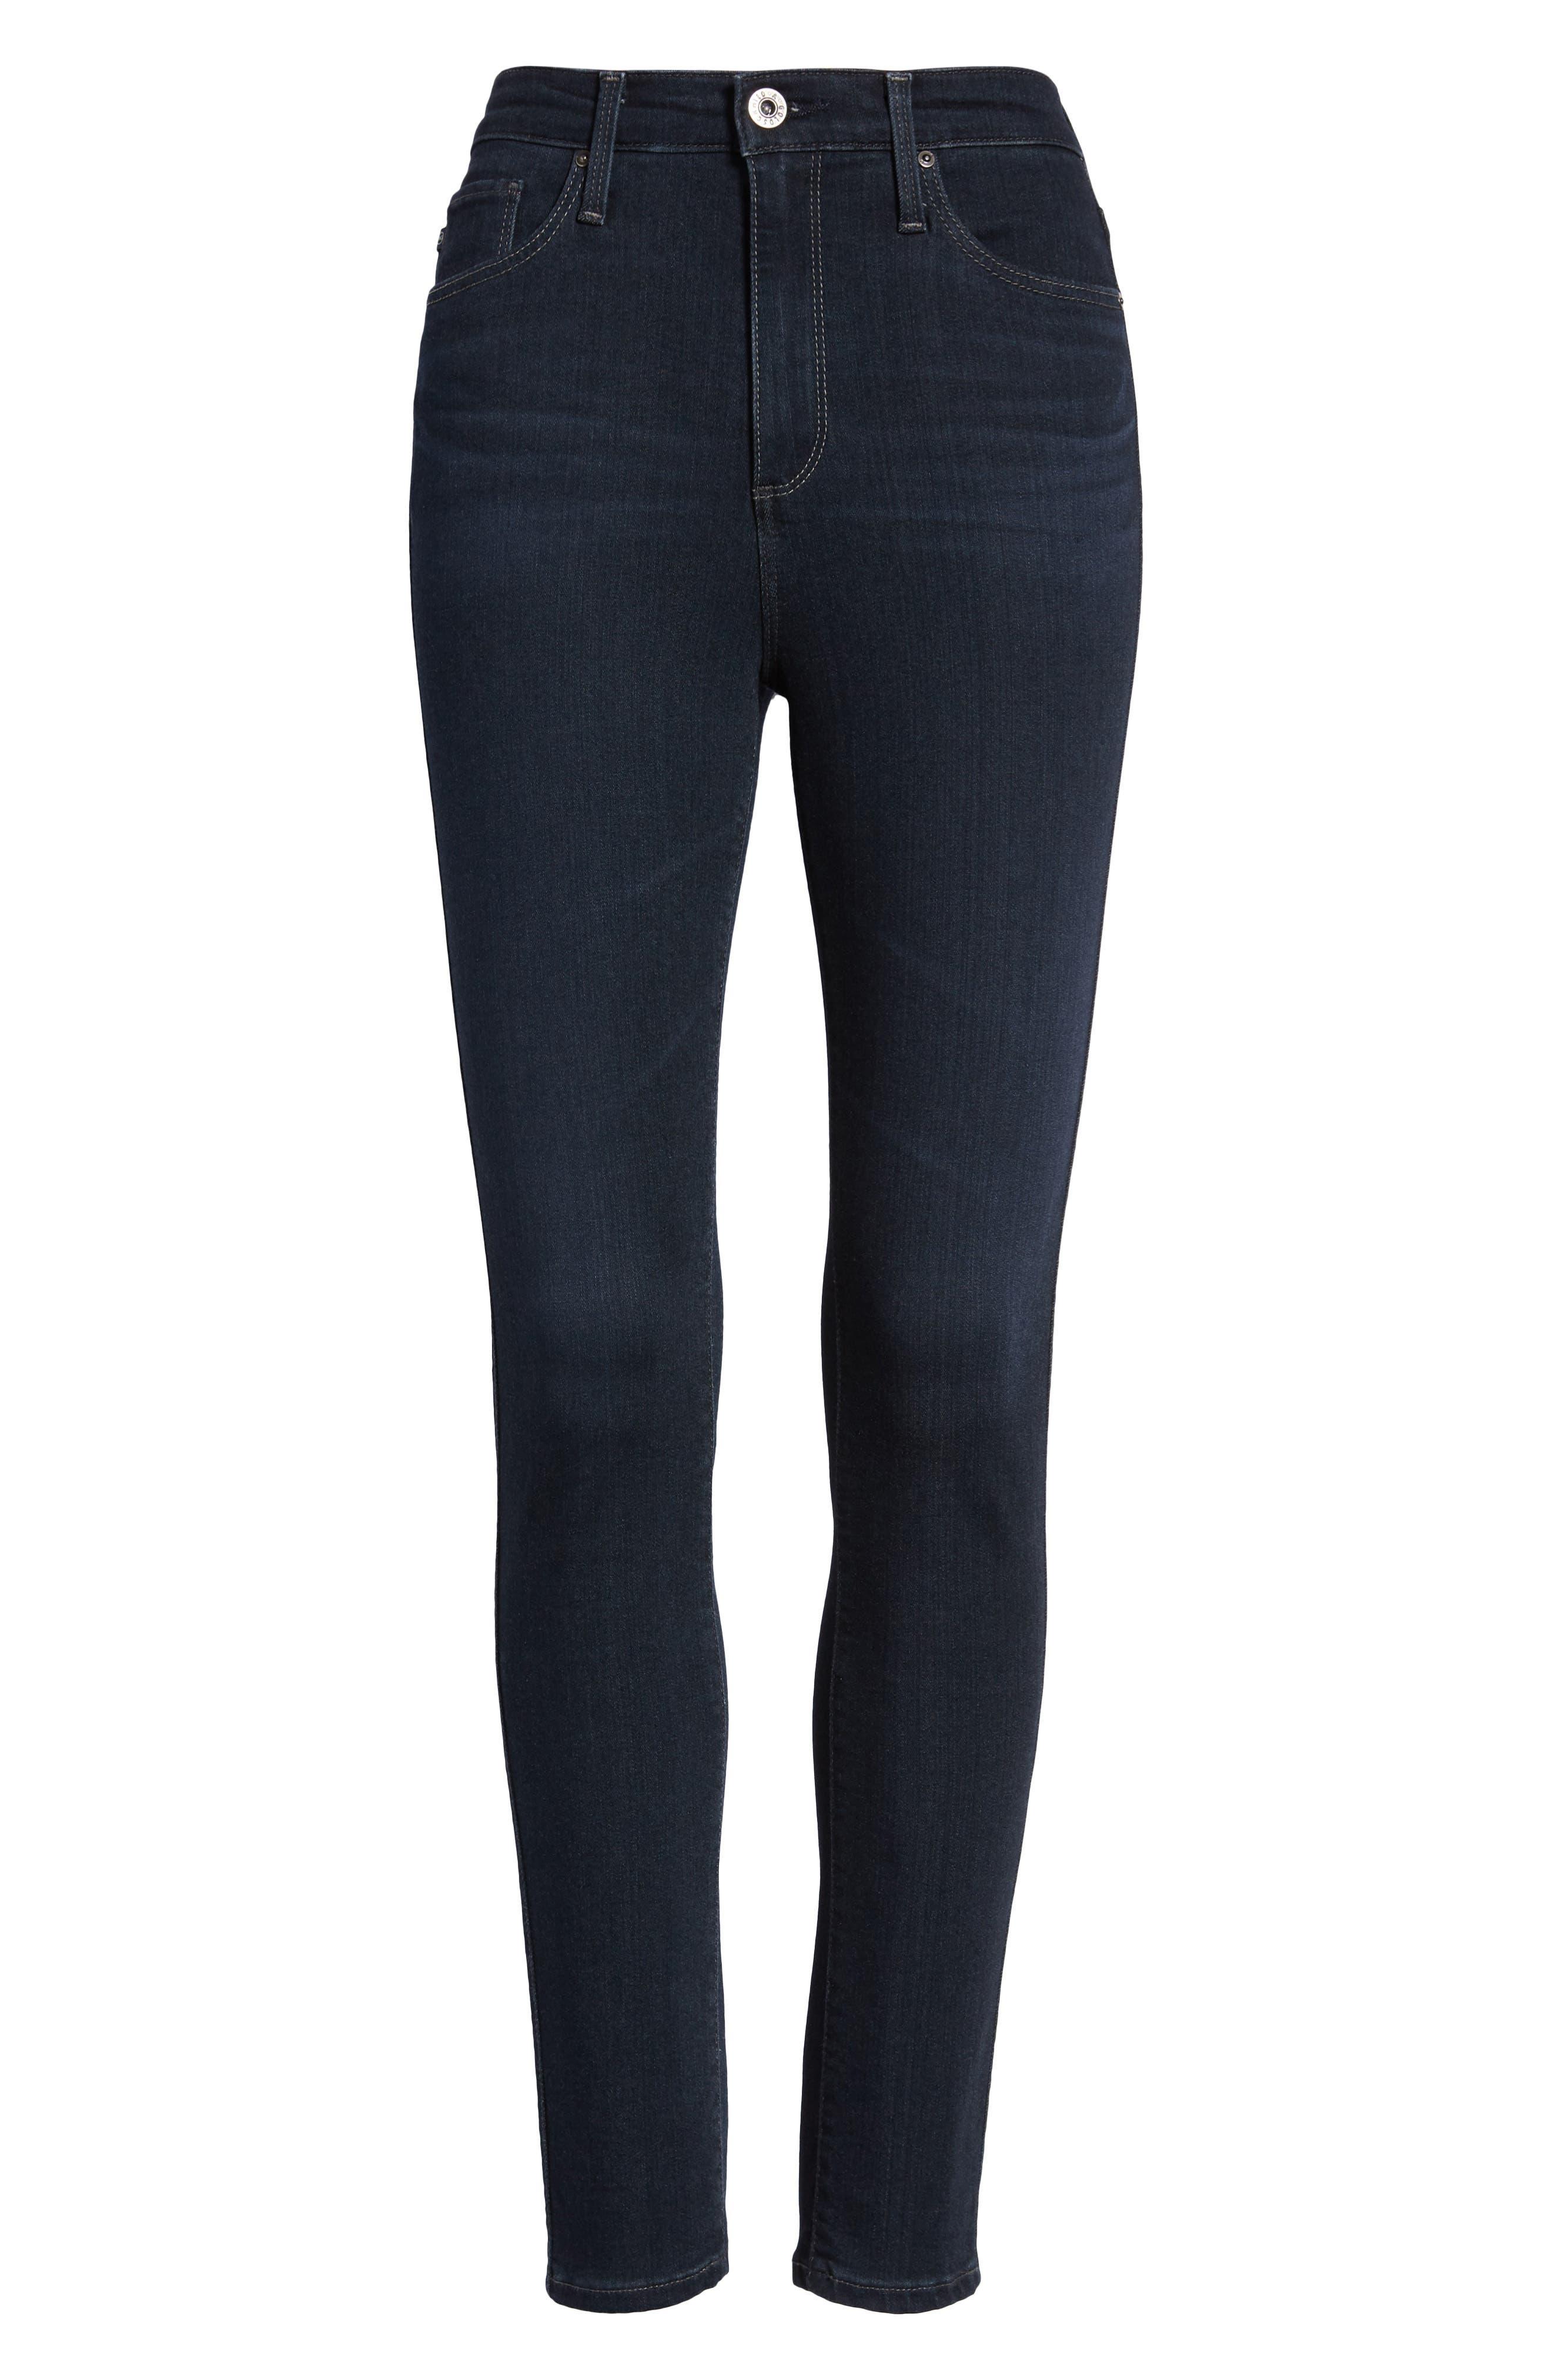 AG, The Mila Super High Waist Ankle Skinny Jeans, Alternate thumbnail 7, color, AUDACIOUS